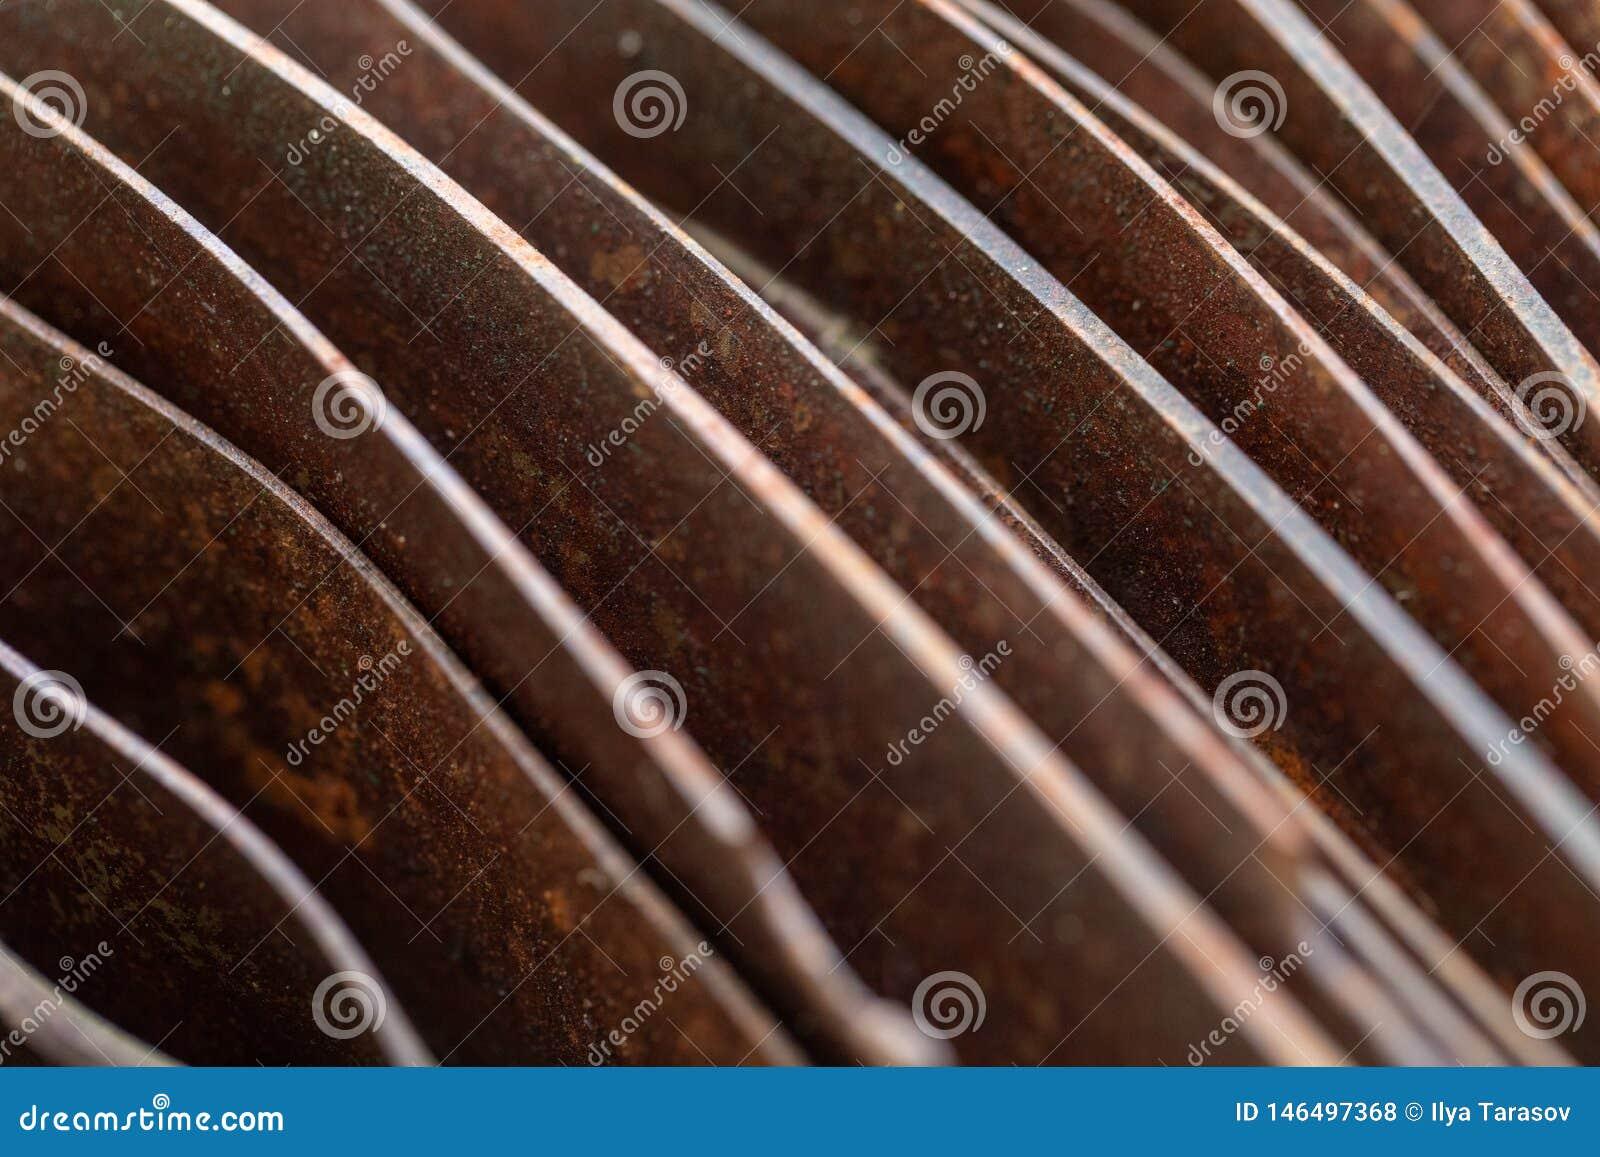 Malerische gebogene Bl?tter des rostigen Metalls Gebogene rostige Bl?tter des Metalls Industrielle Abstraktion